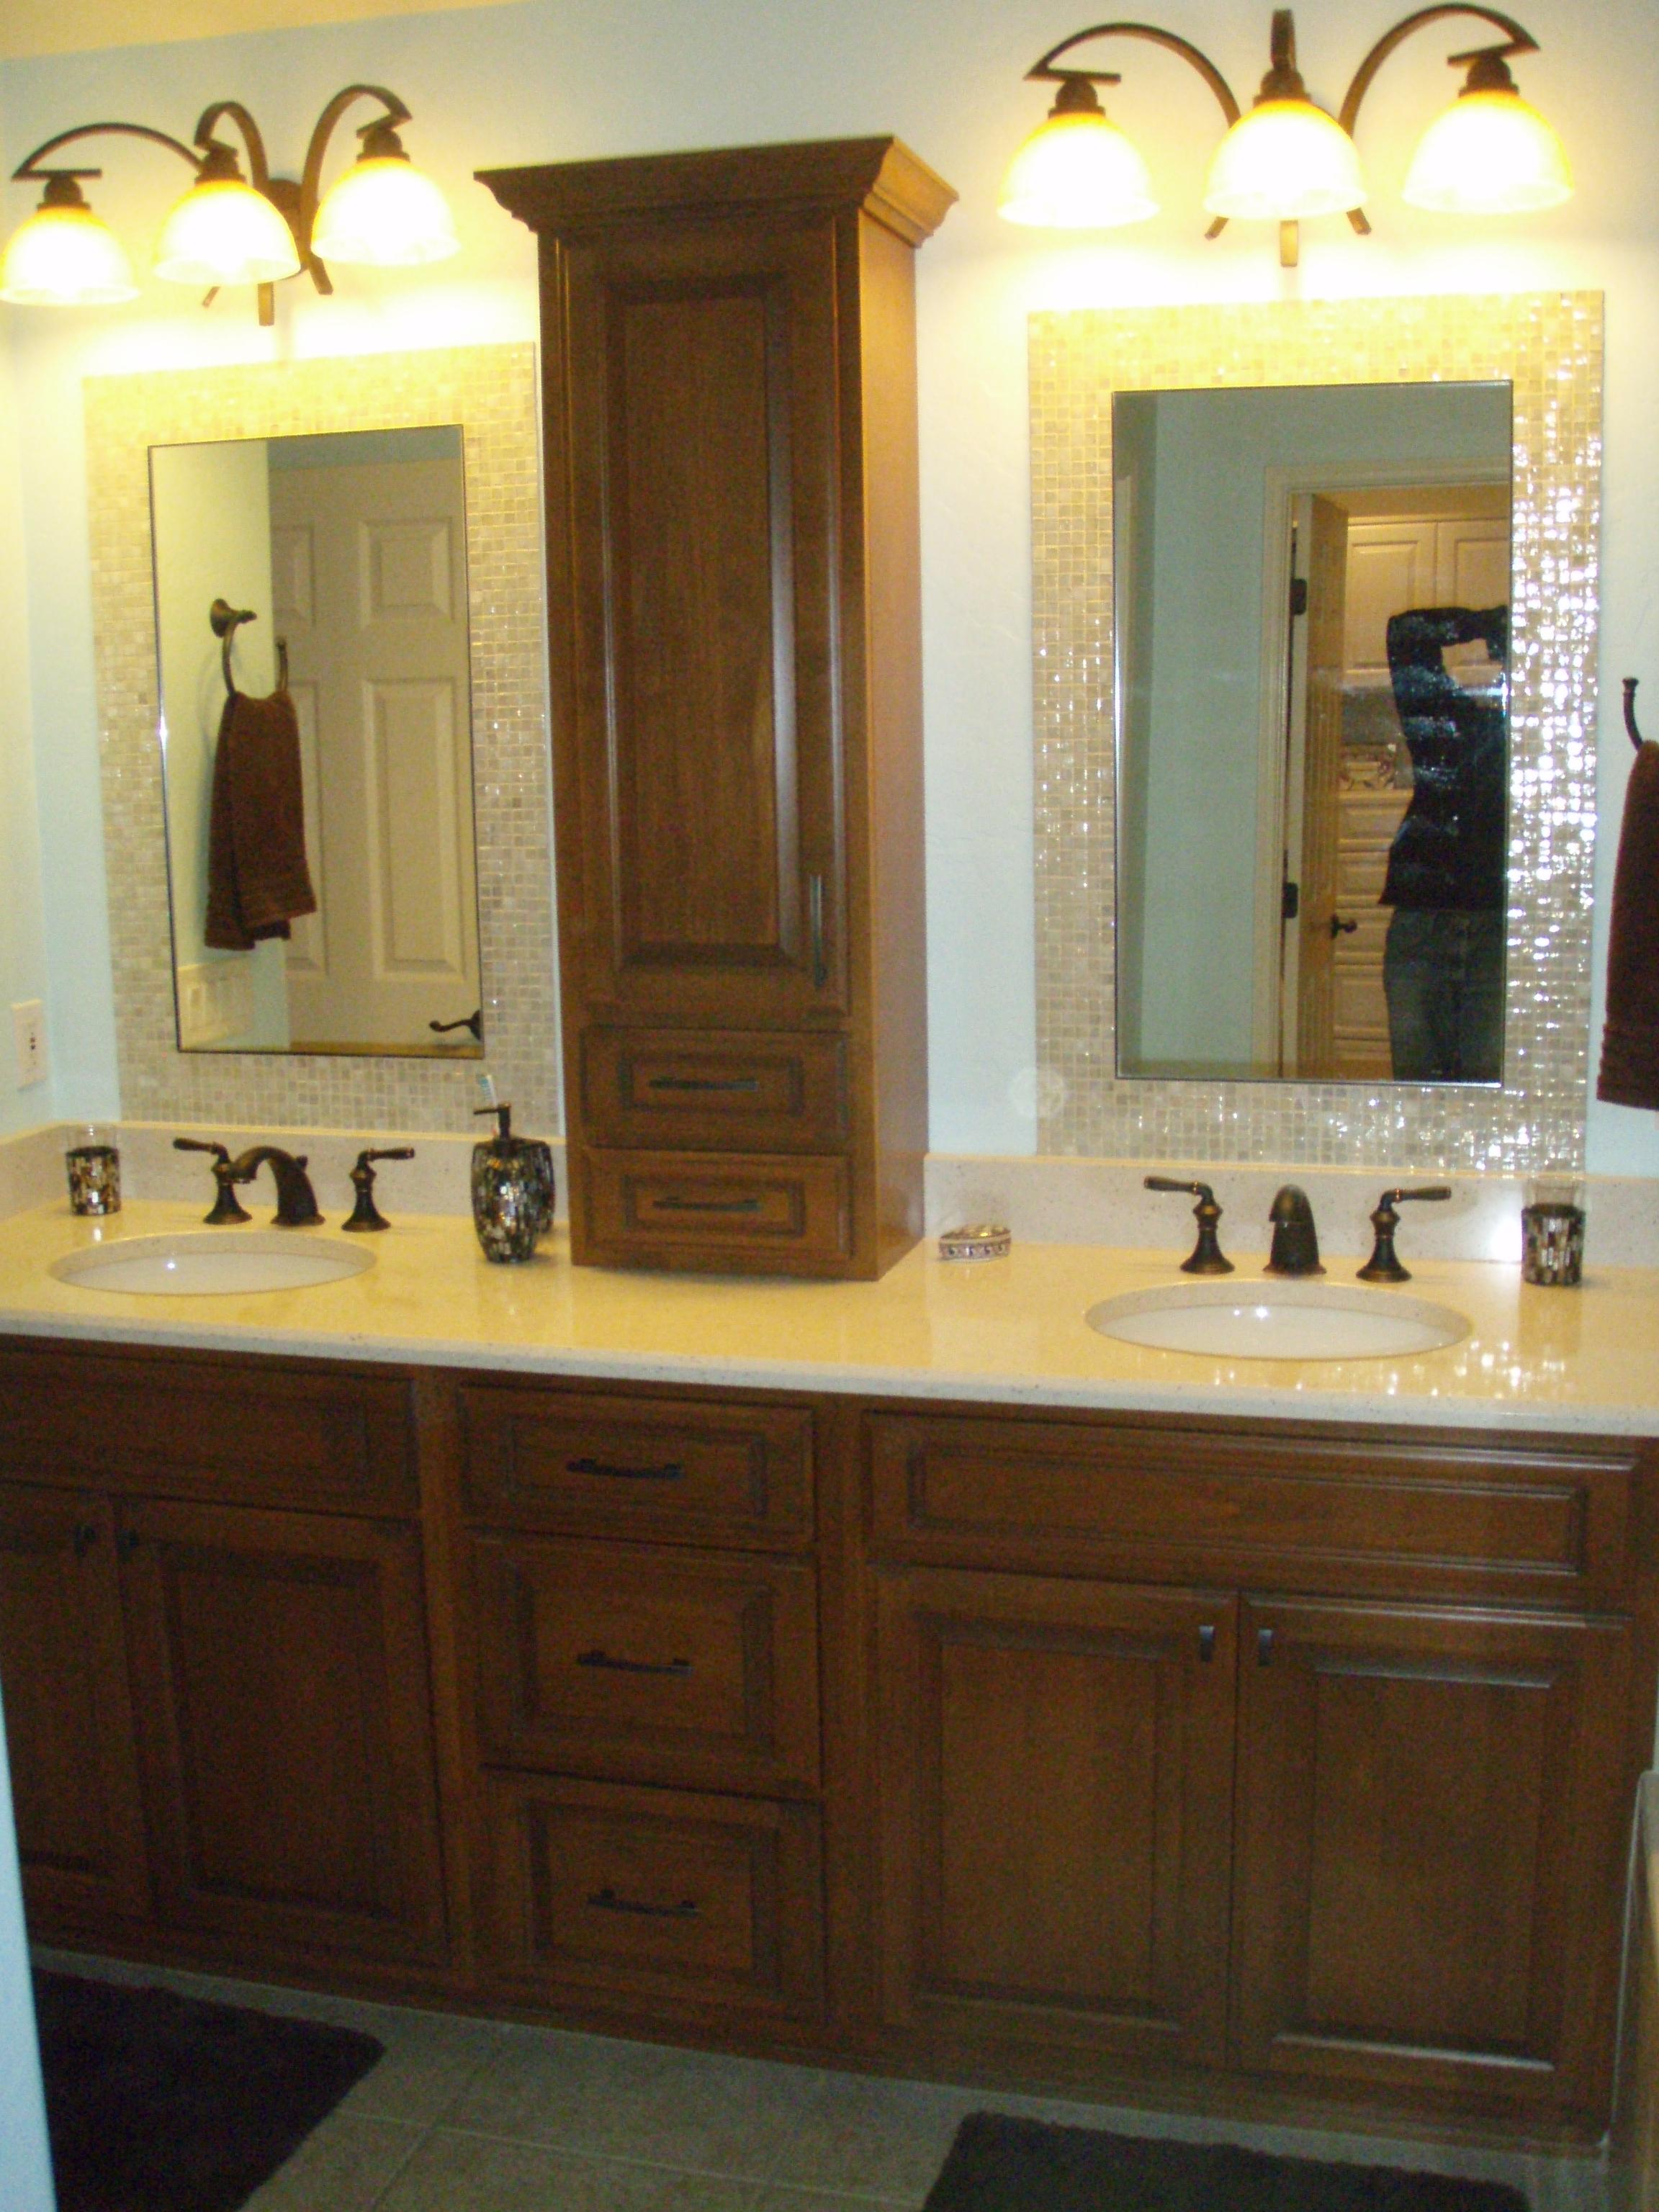 Bathroom Cabinets Tucson laundry & bath storage cabinets tucson | storage shelvescloset